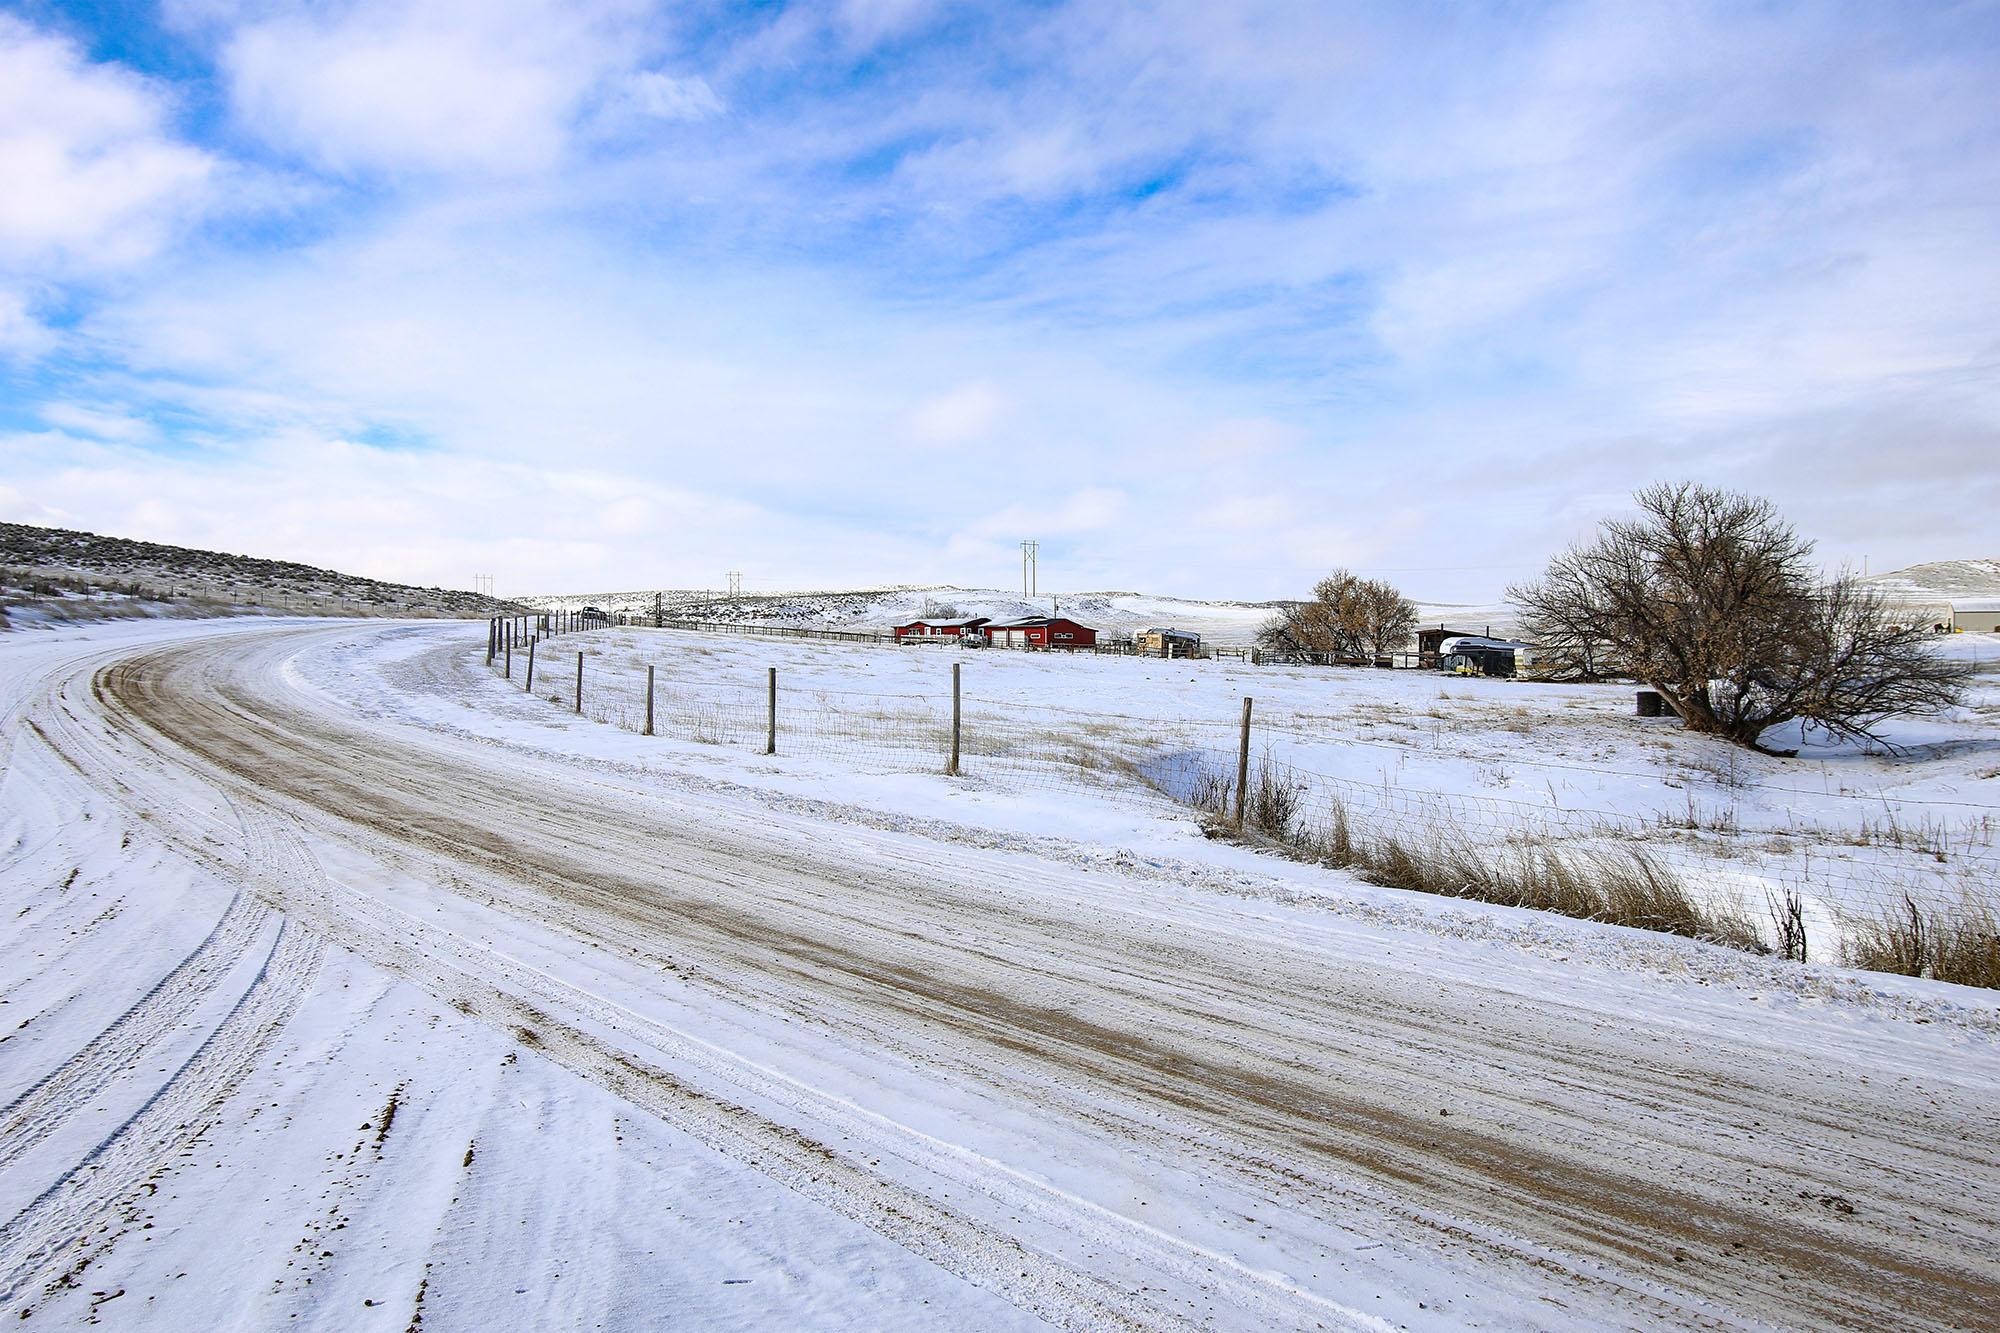 350 Beatty Gulch Road, Sheridan, Wyoming 82801, 3 Bedrooms Bedrooms, ,2.5 BathroomsBathrooms,Ranch,For Sale,Beatty Gulch,19-131